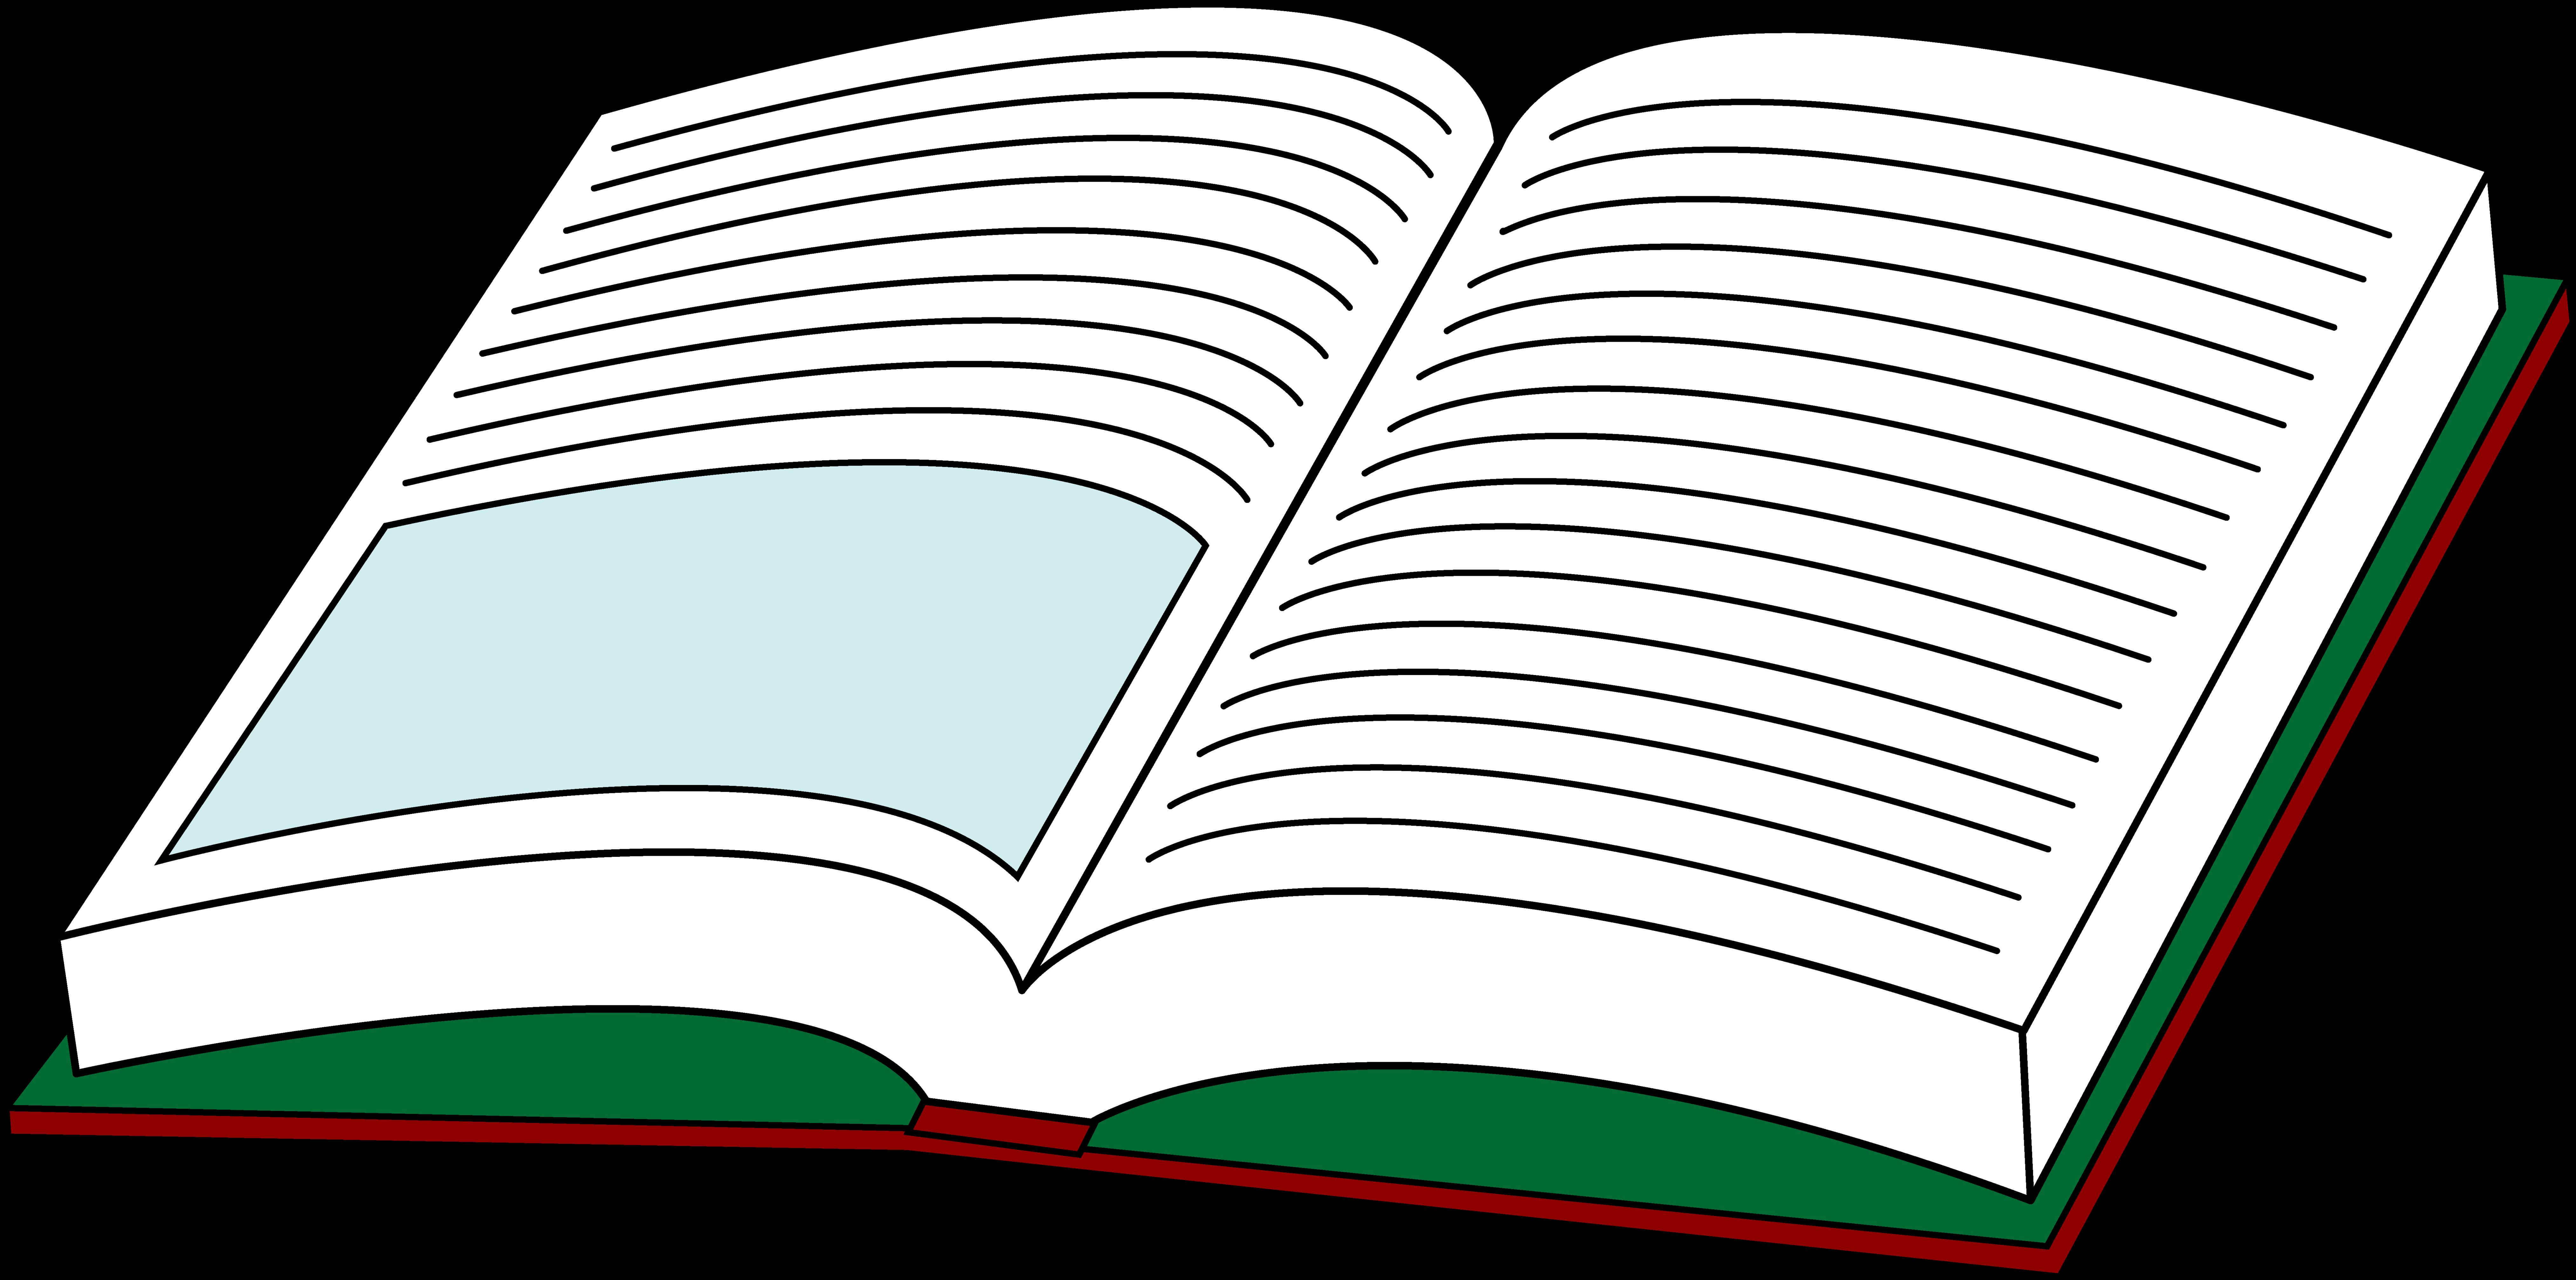 8104x4026 Open Book Cliparts Free Clip Art